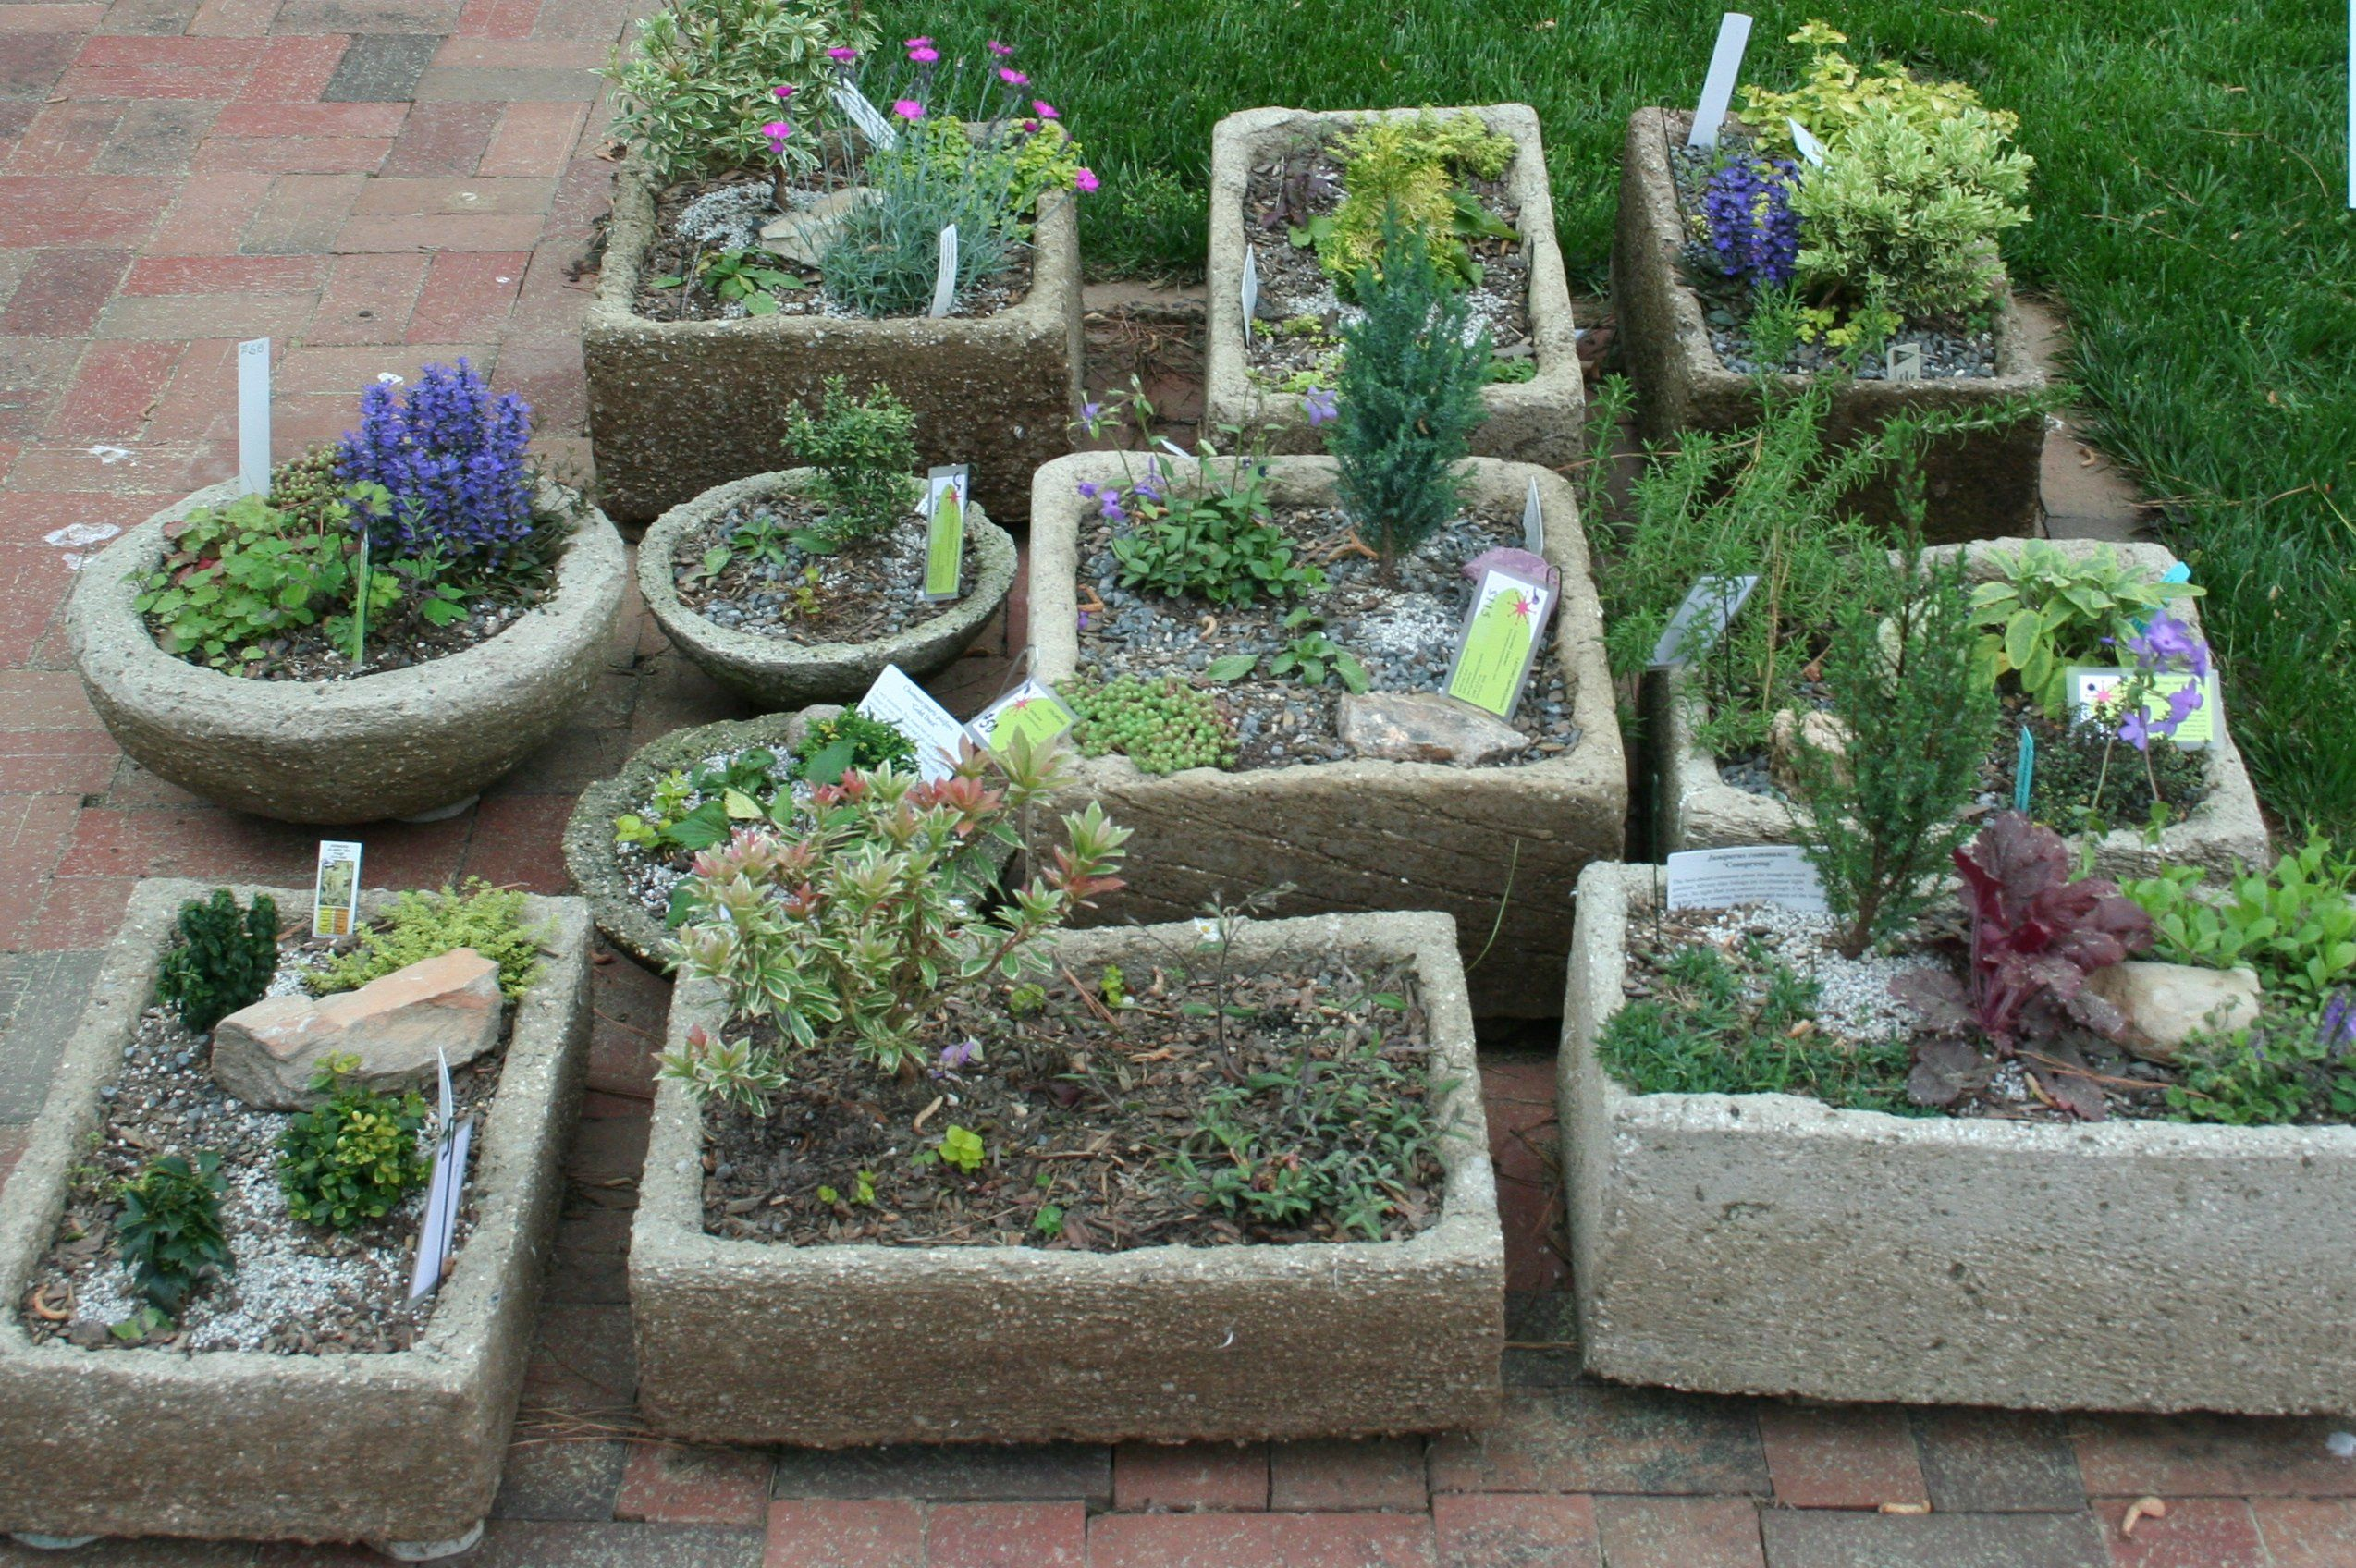 Making A Hypertufa Trough Better Homes And Gardens Planters Gardens And Herbs Garden